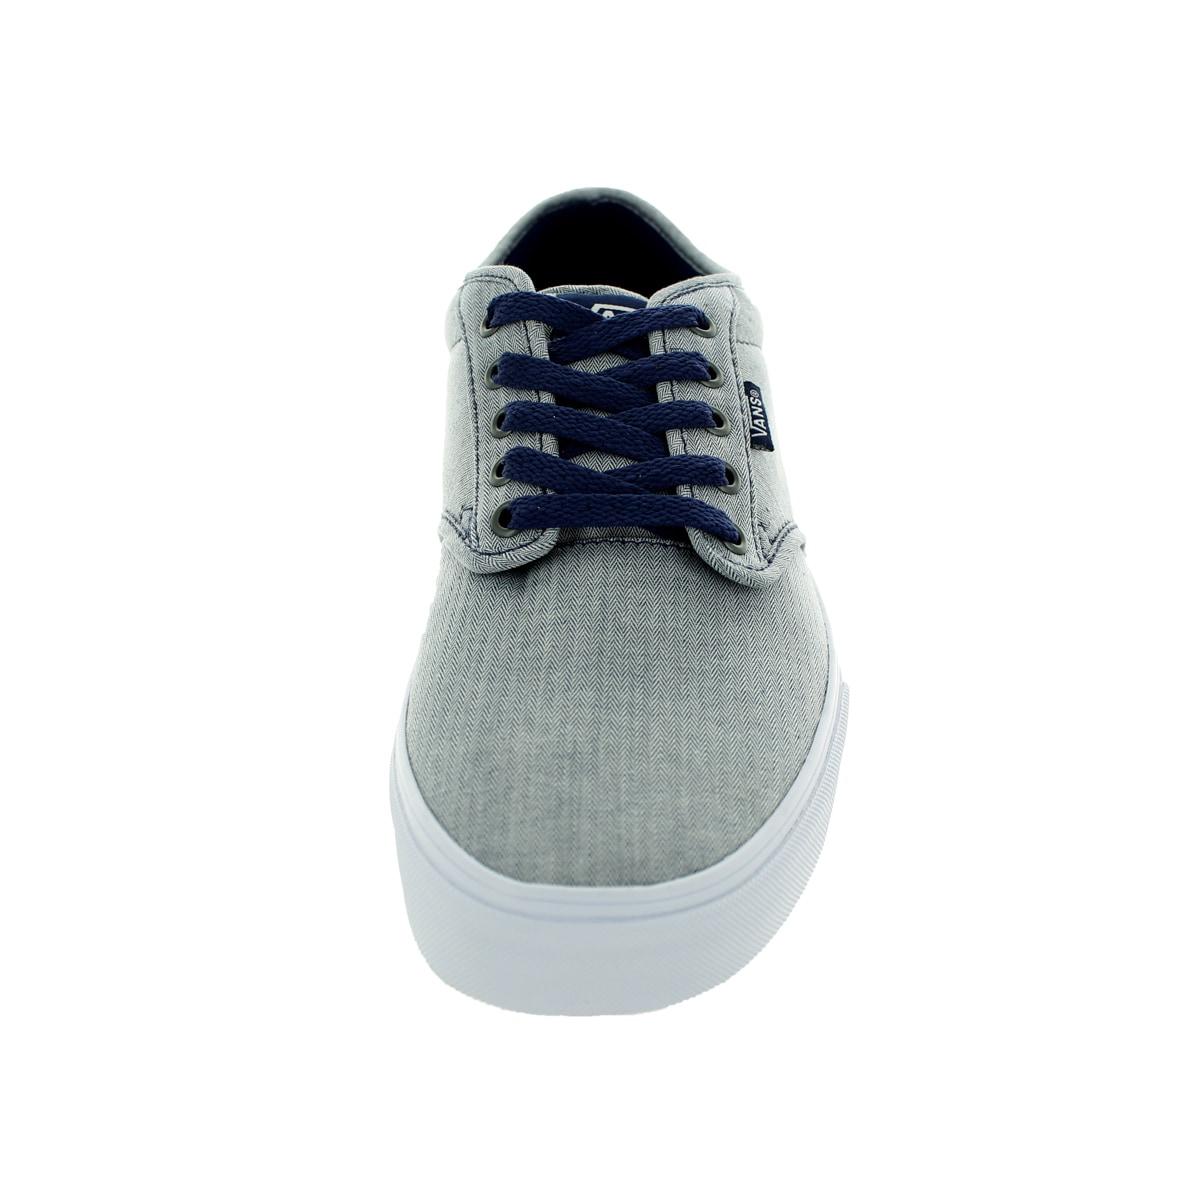 Check vans out 28ac0 e9c0b vans Check men 039 s atwood skate shoe ... 15082c